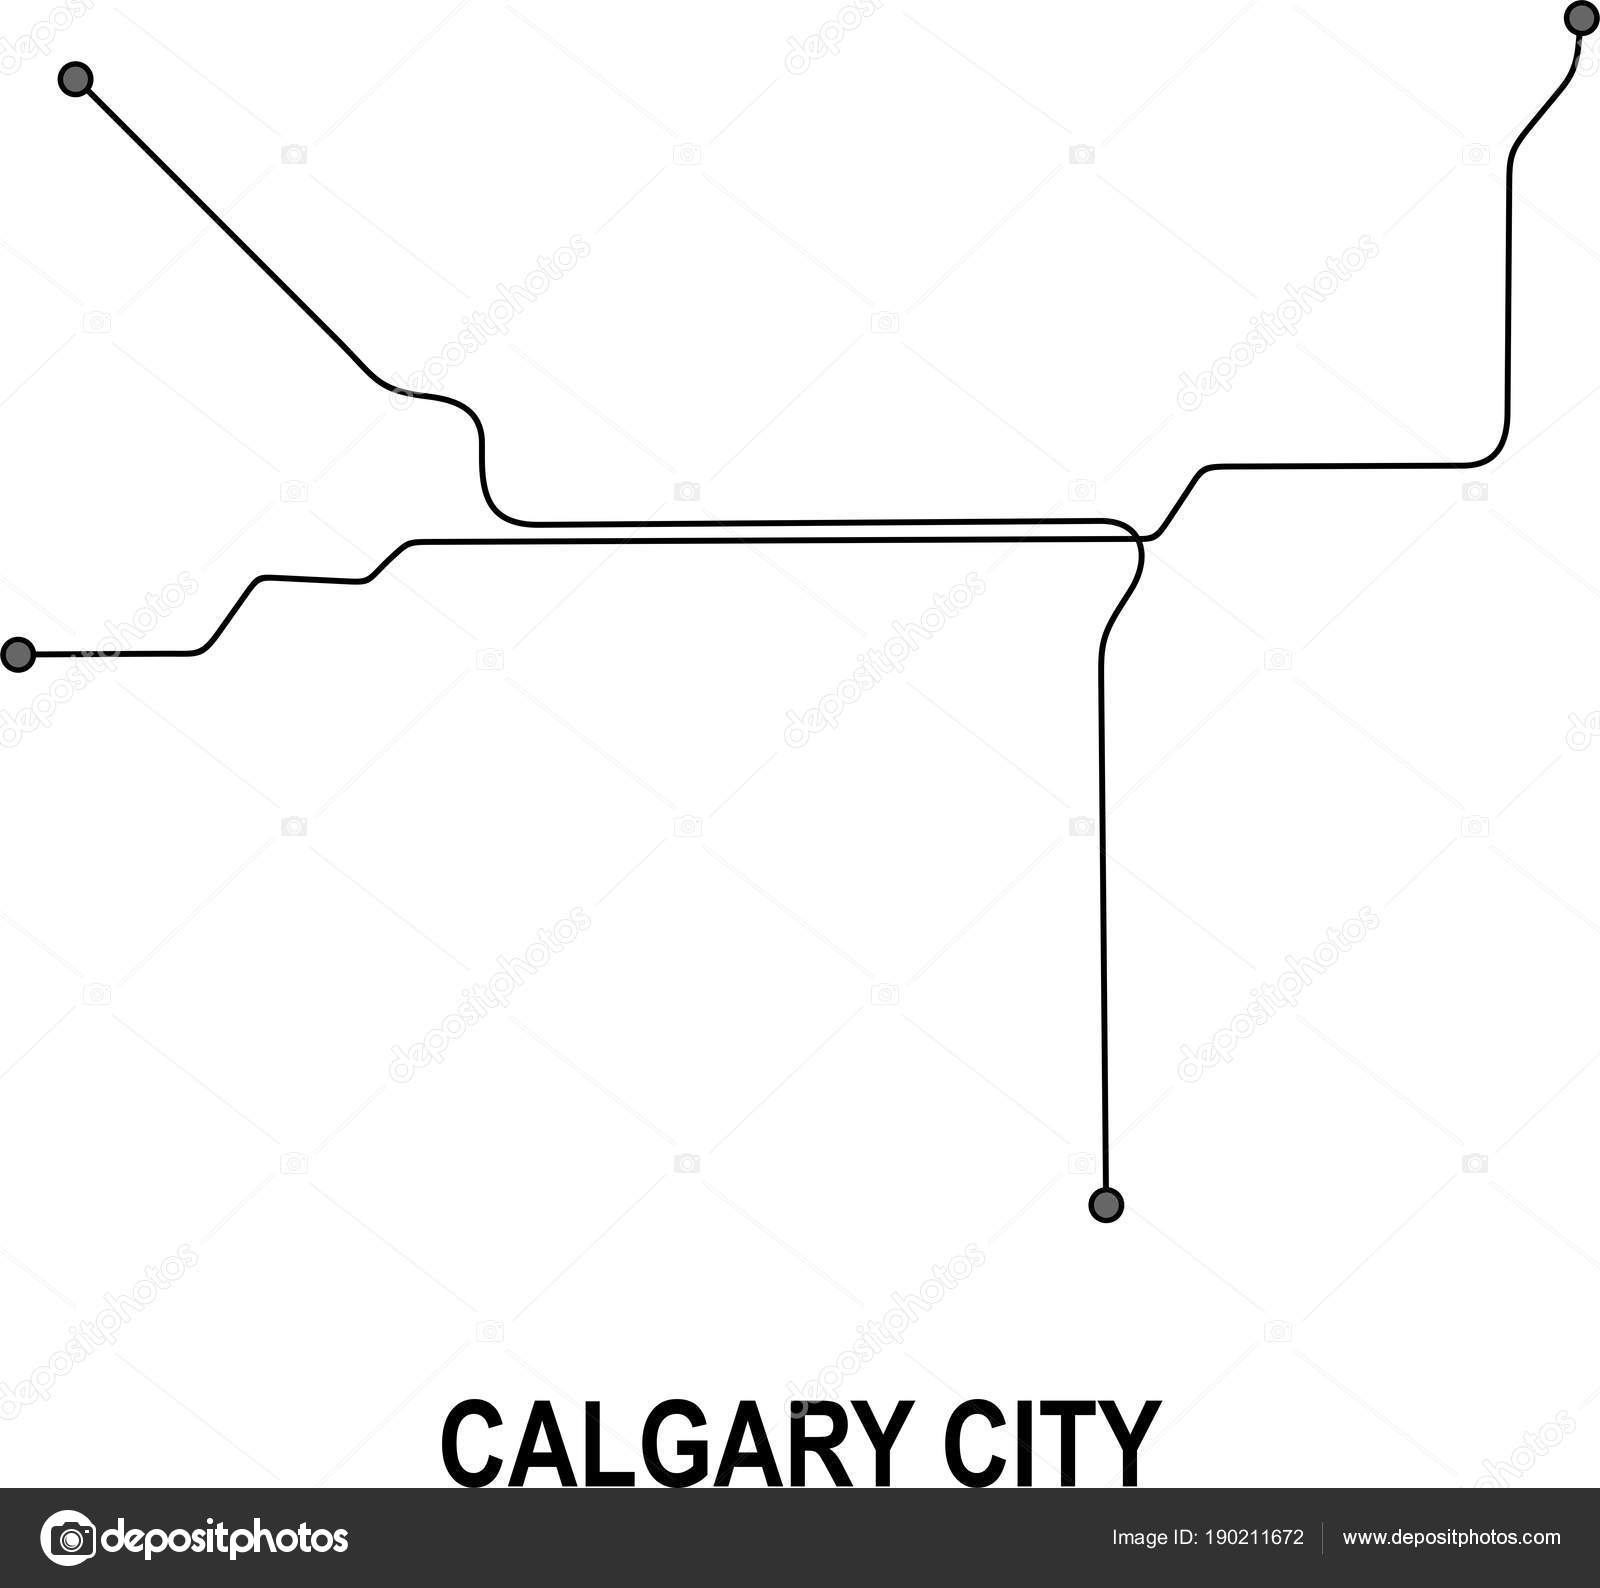 Calgary Subway Map.Calgary Subway Vector Map File Stock Vector C Fishvector 190211672